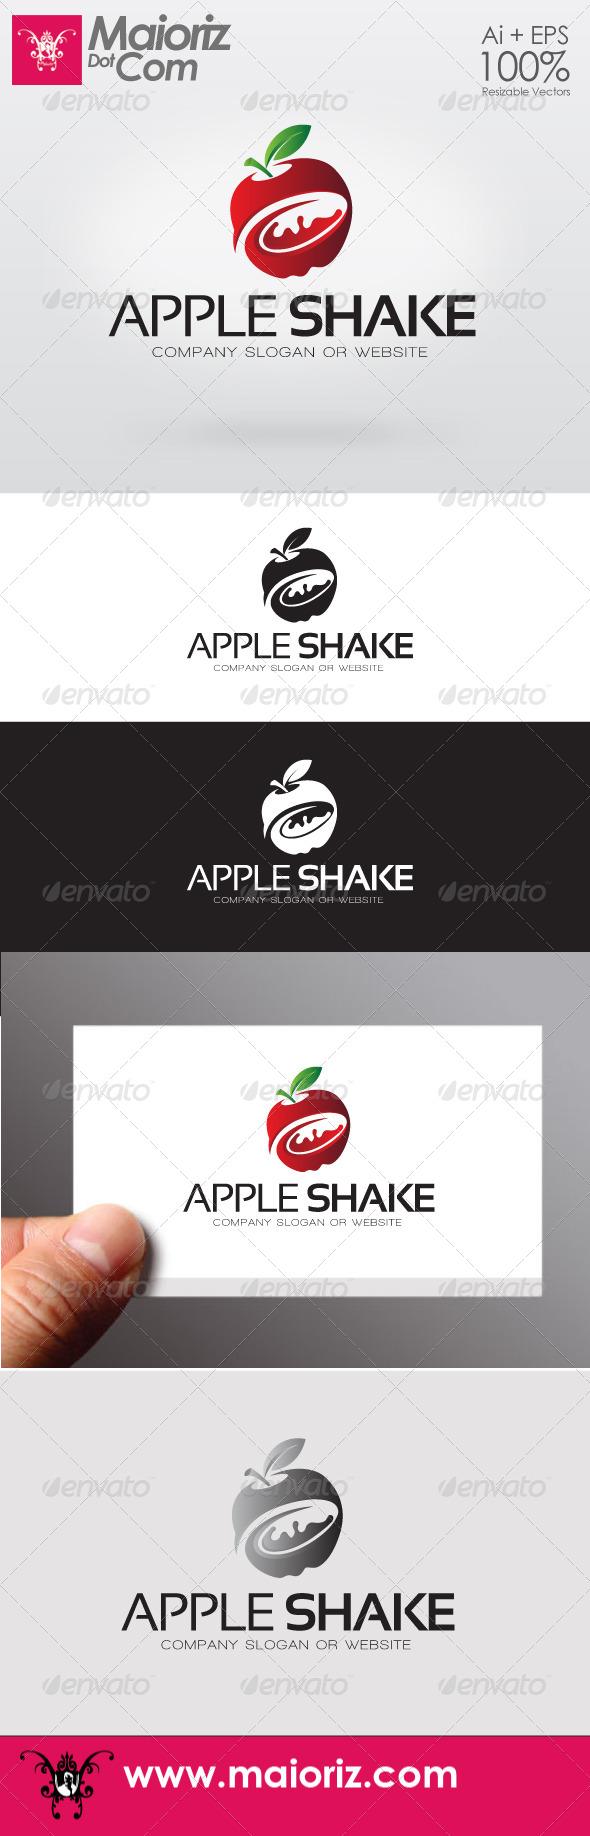 GraphicRiver Apple Shake Logo 6704830